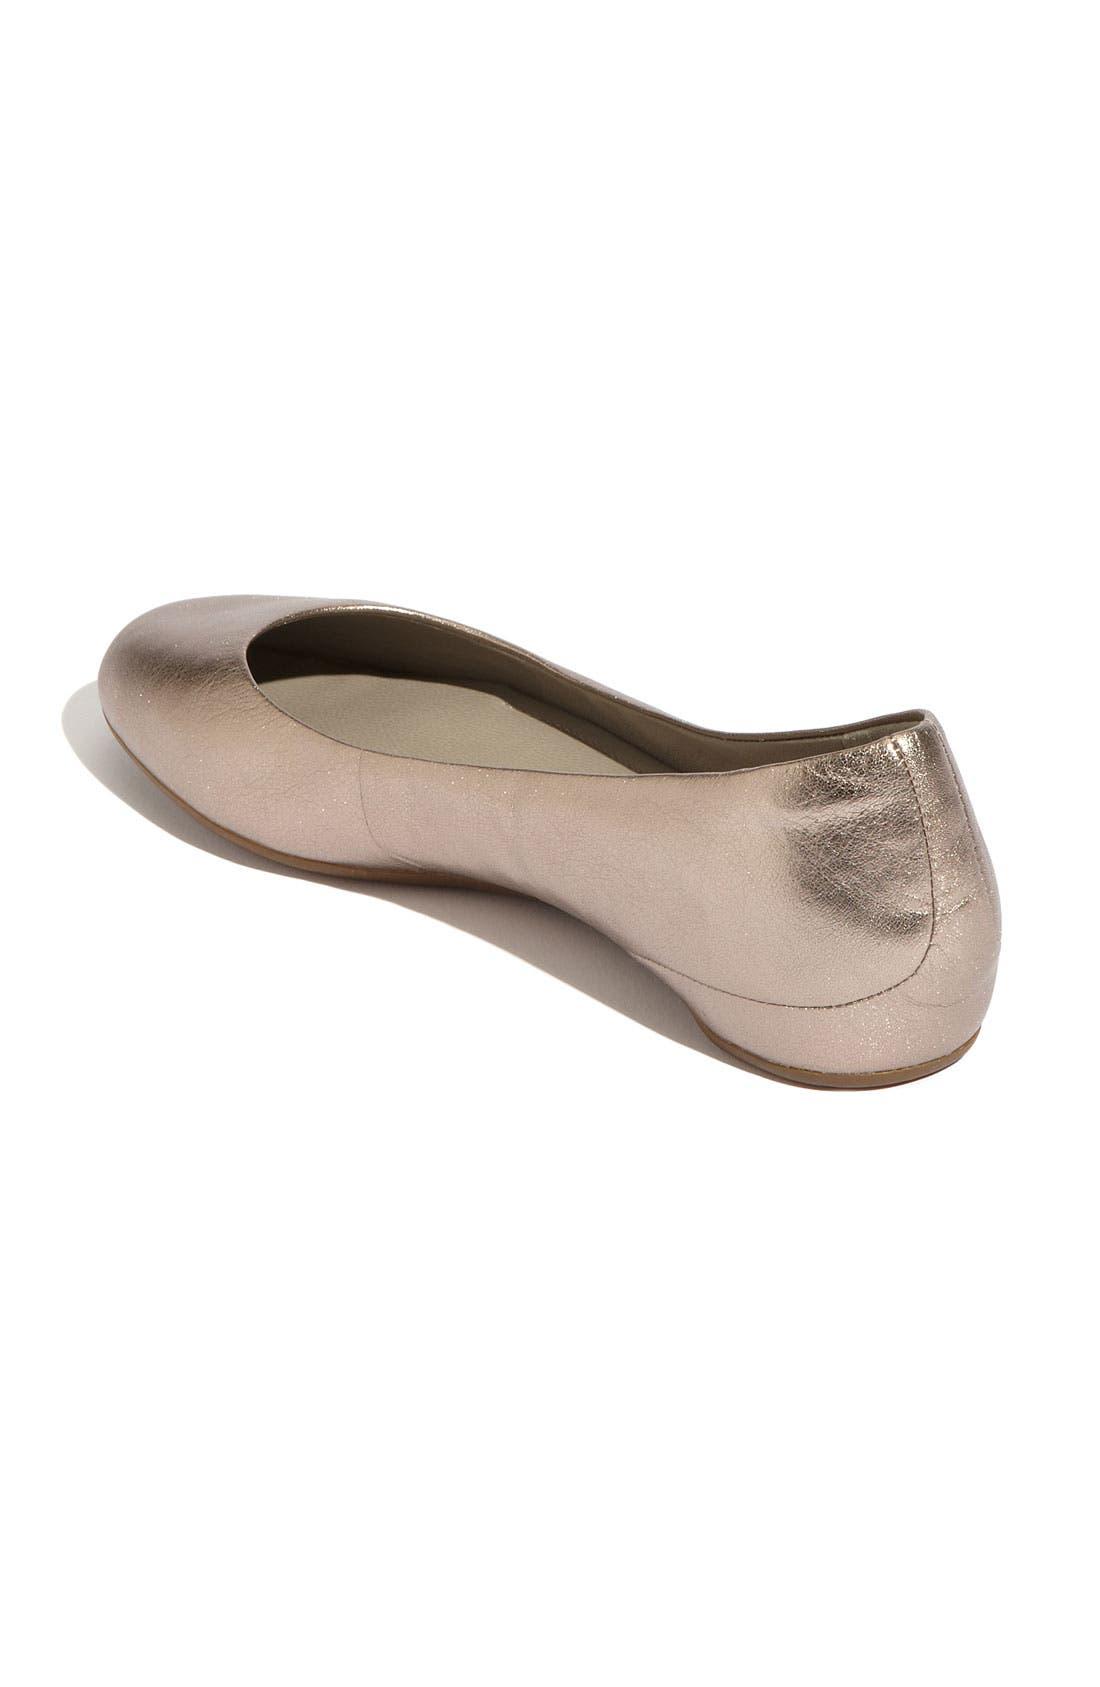 Alternate Image 2  - ECCO 'Mary' Ballerina Flat